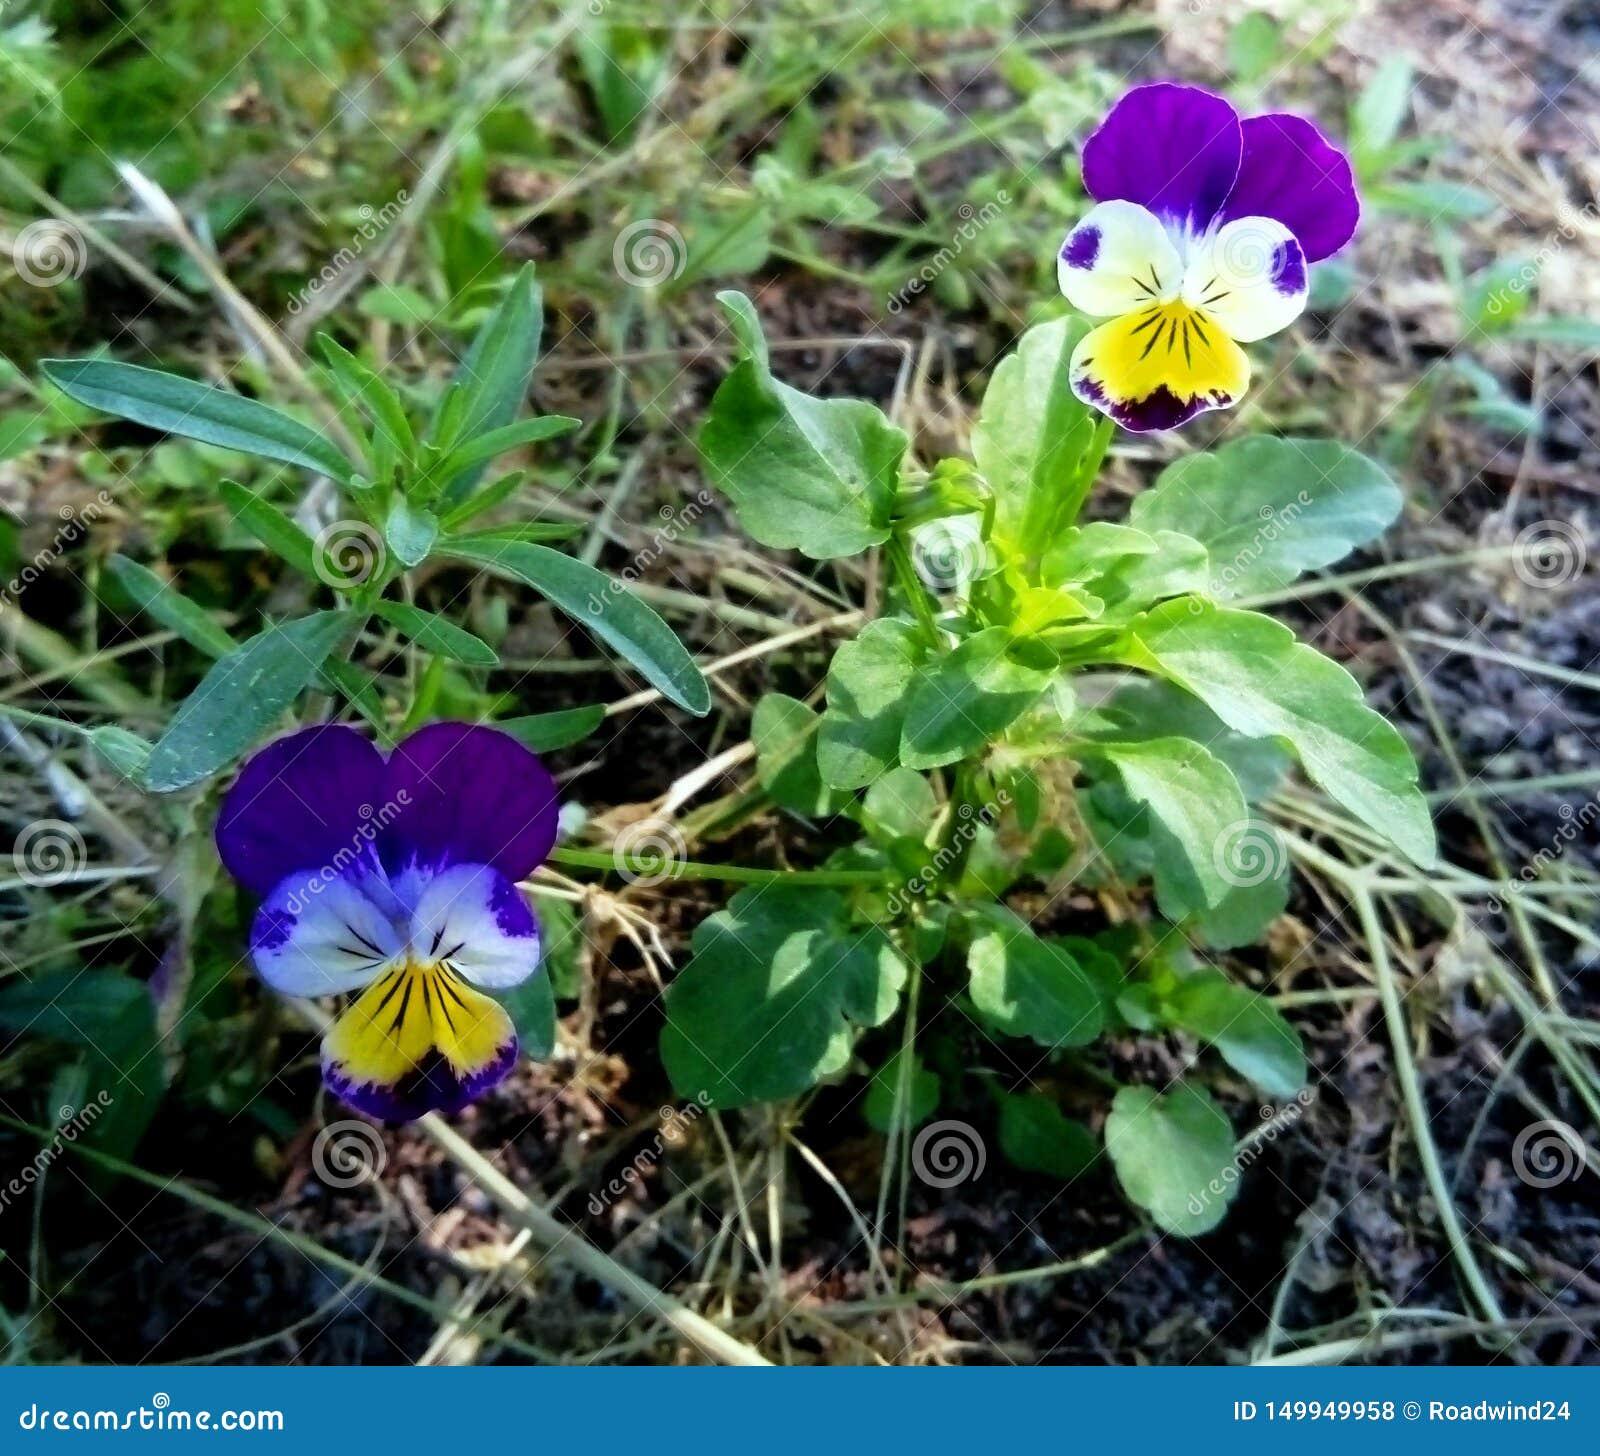 Flores minúsculas tricolor da viola